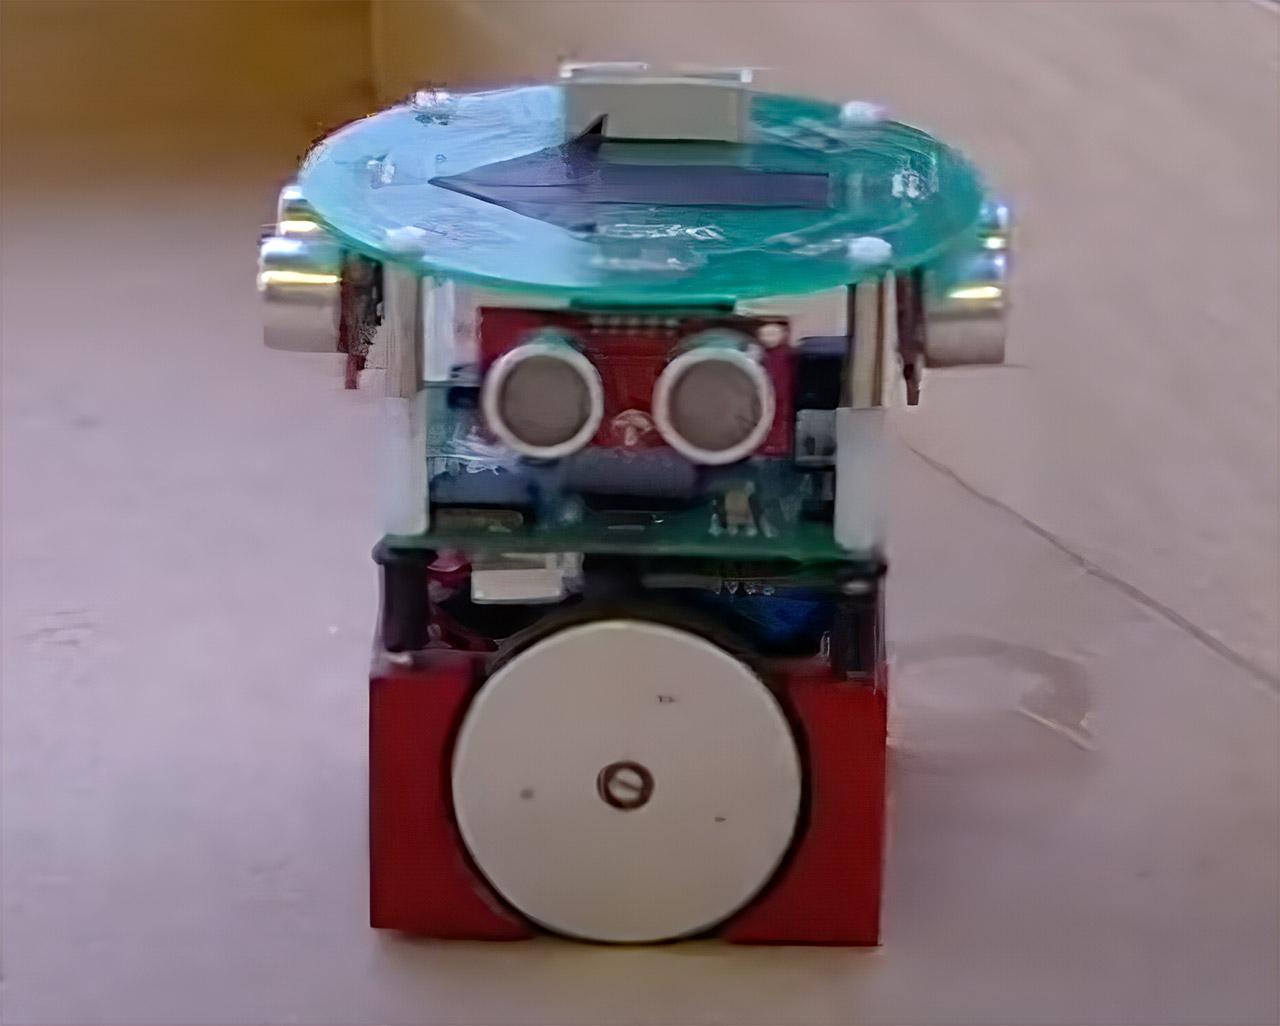 Rat Brain Controlled Robot